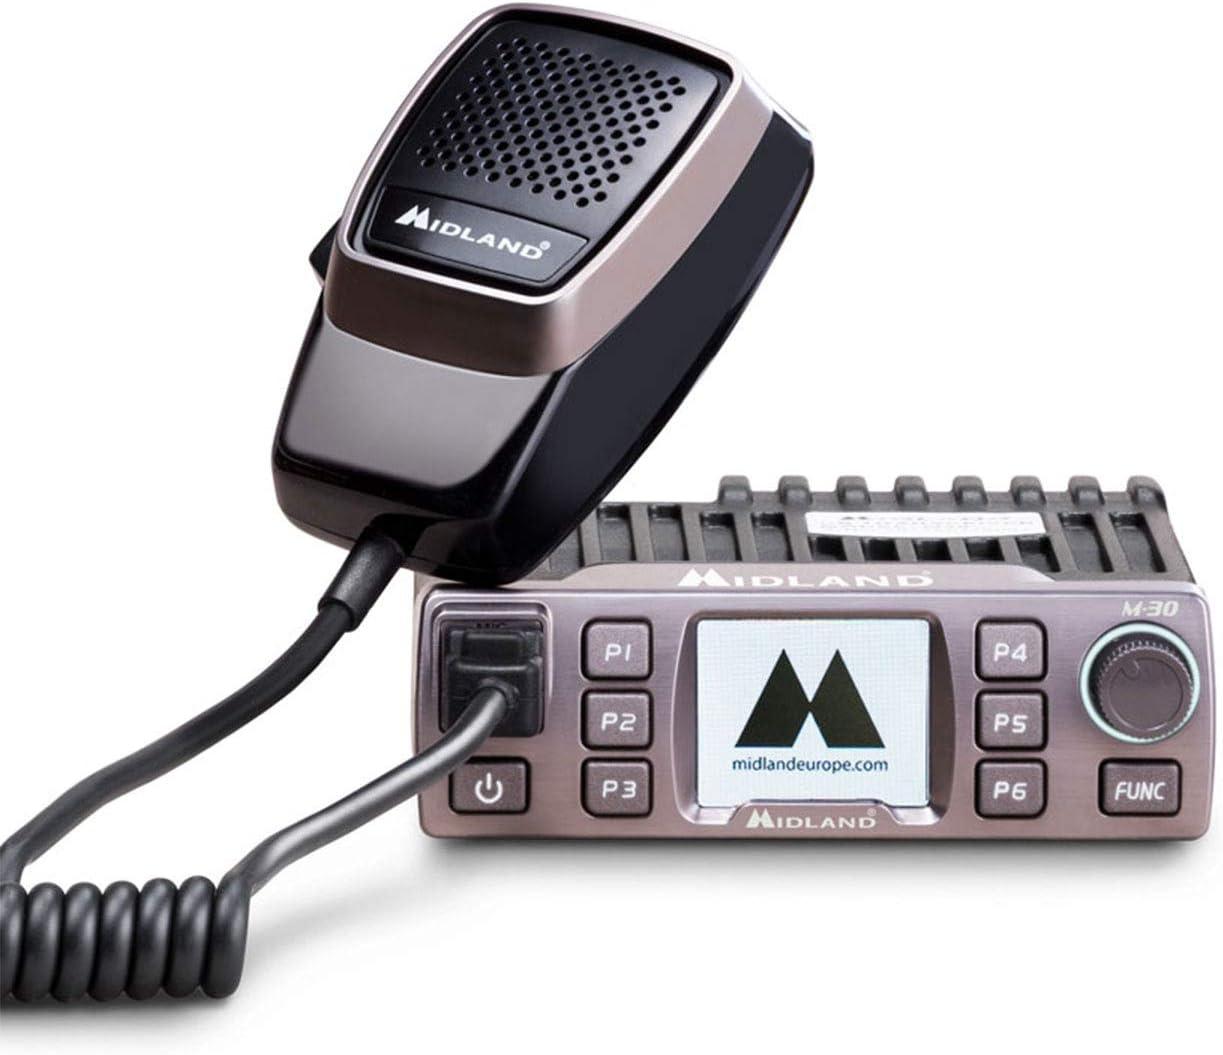 Midland M 30 Cb Funkgerät Mit Mikrofon 12 24v Farbdisplay 6 Programmierbare Tasten Digital Squelch 4 Watt Am Fm Auto